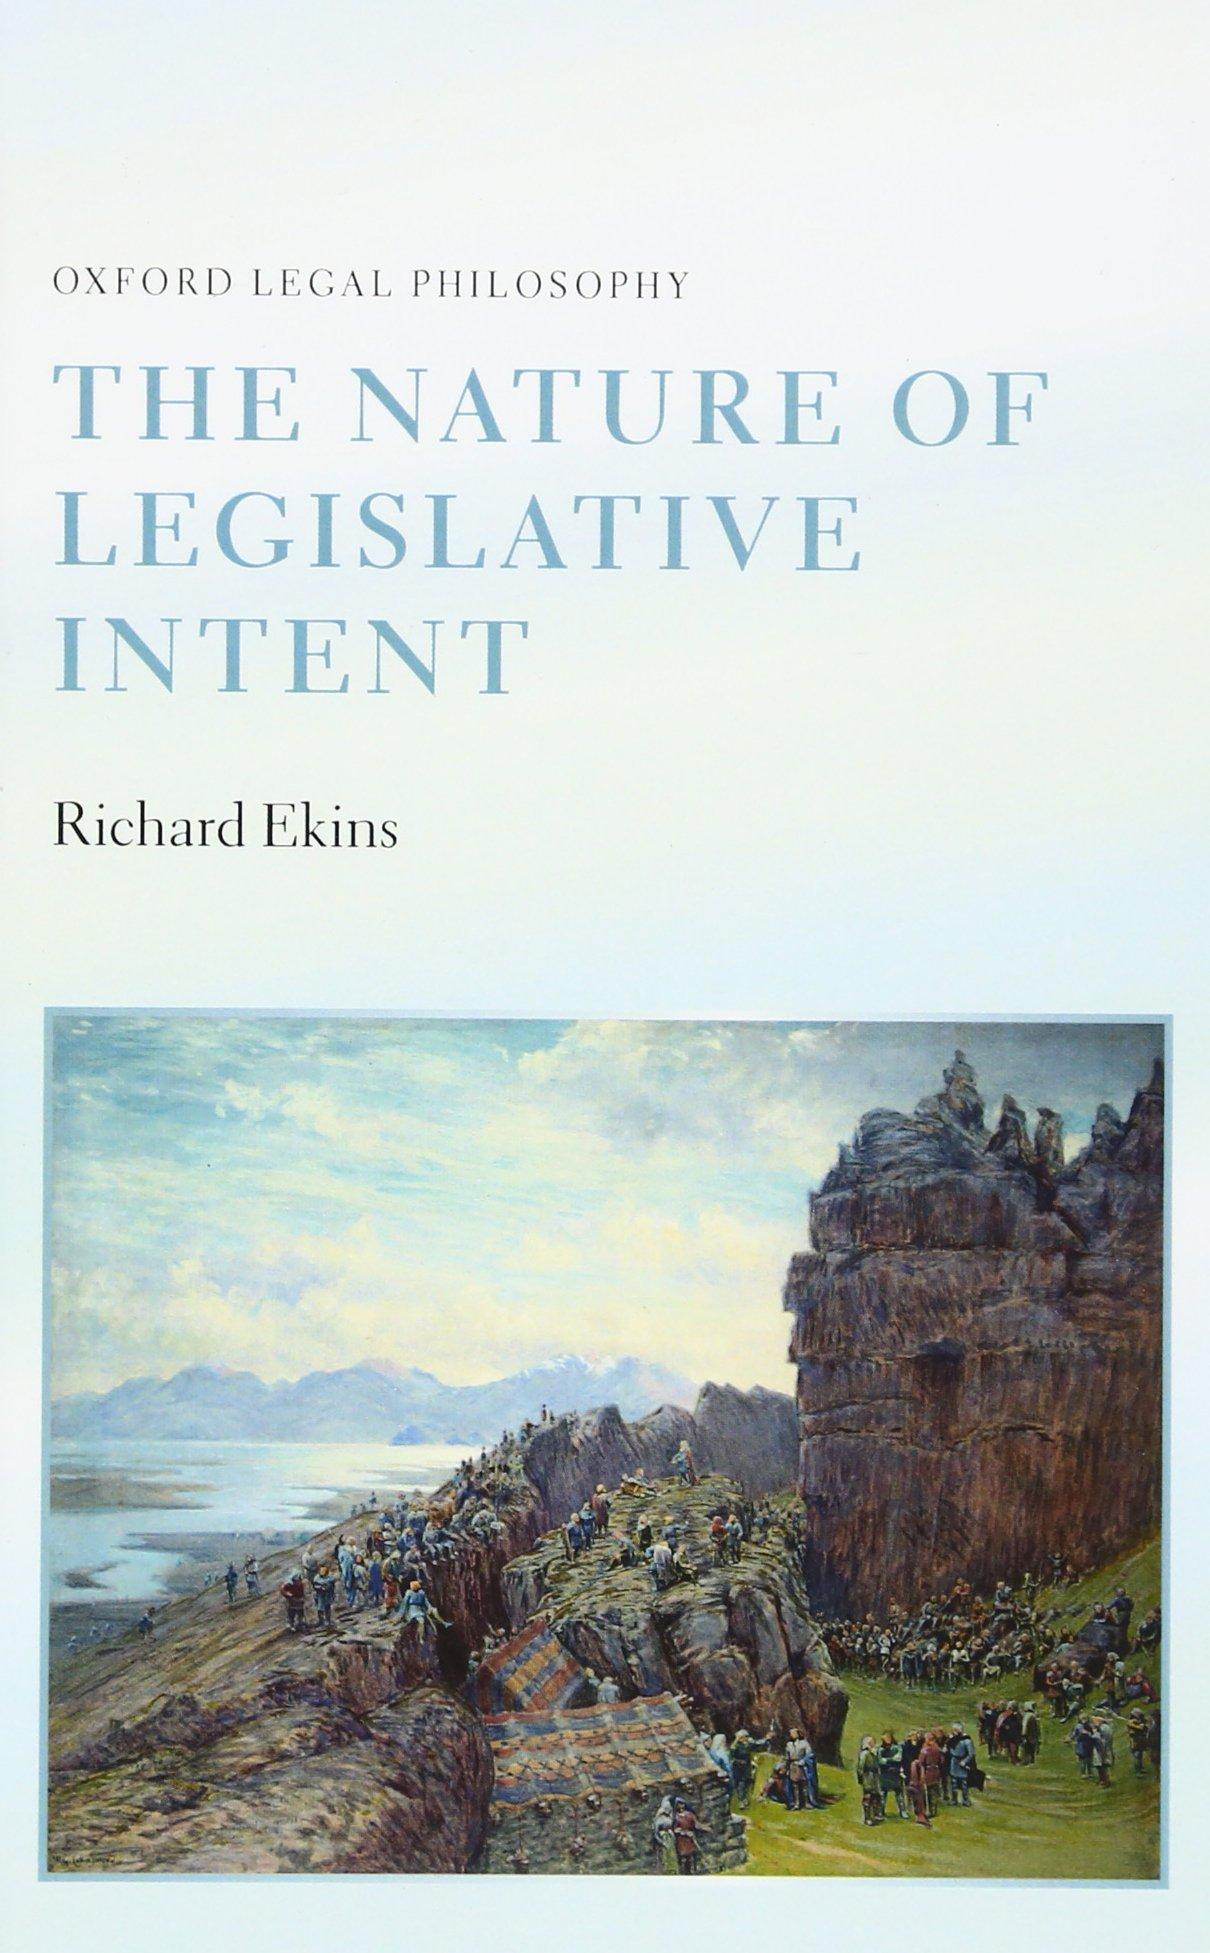 The Nature of Legislative Intent (Oxford Legal Philosophy)